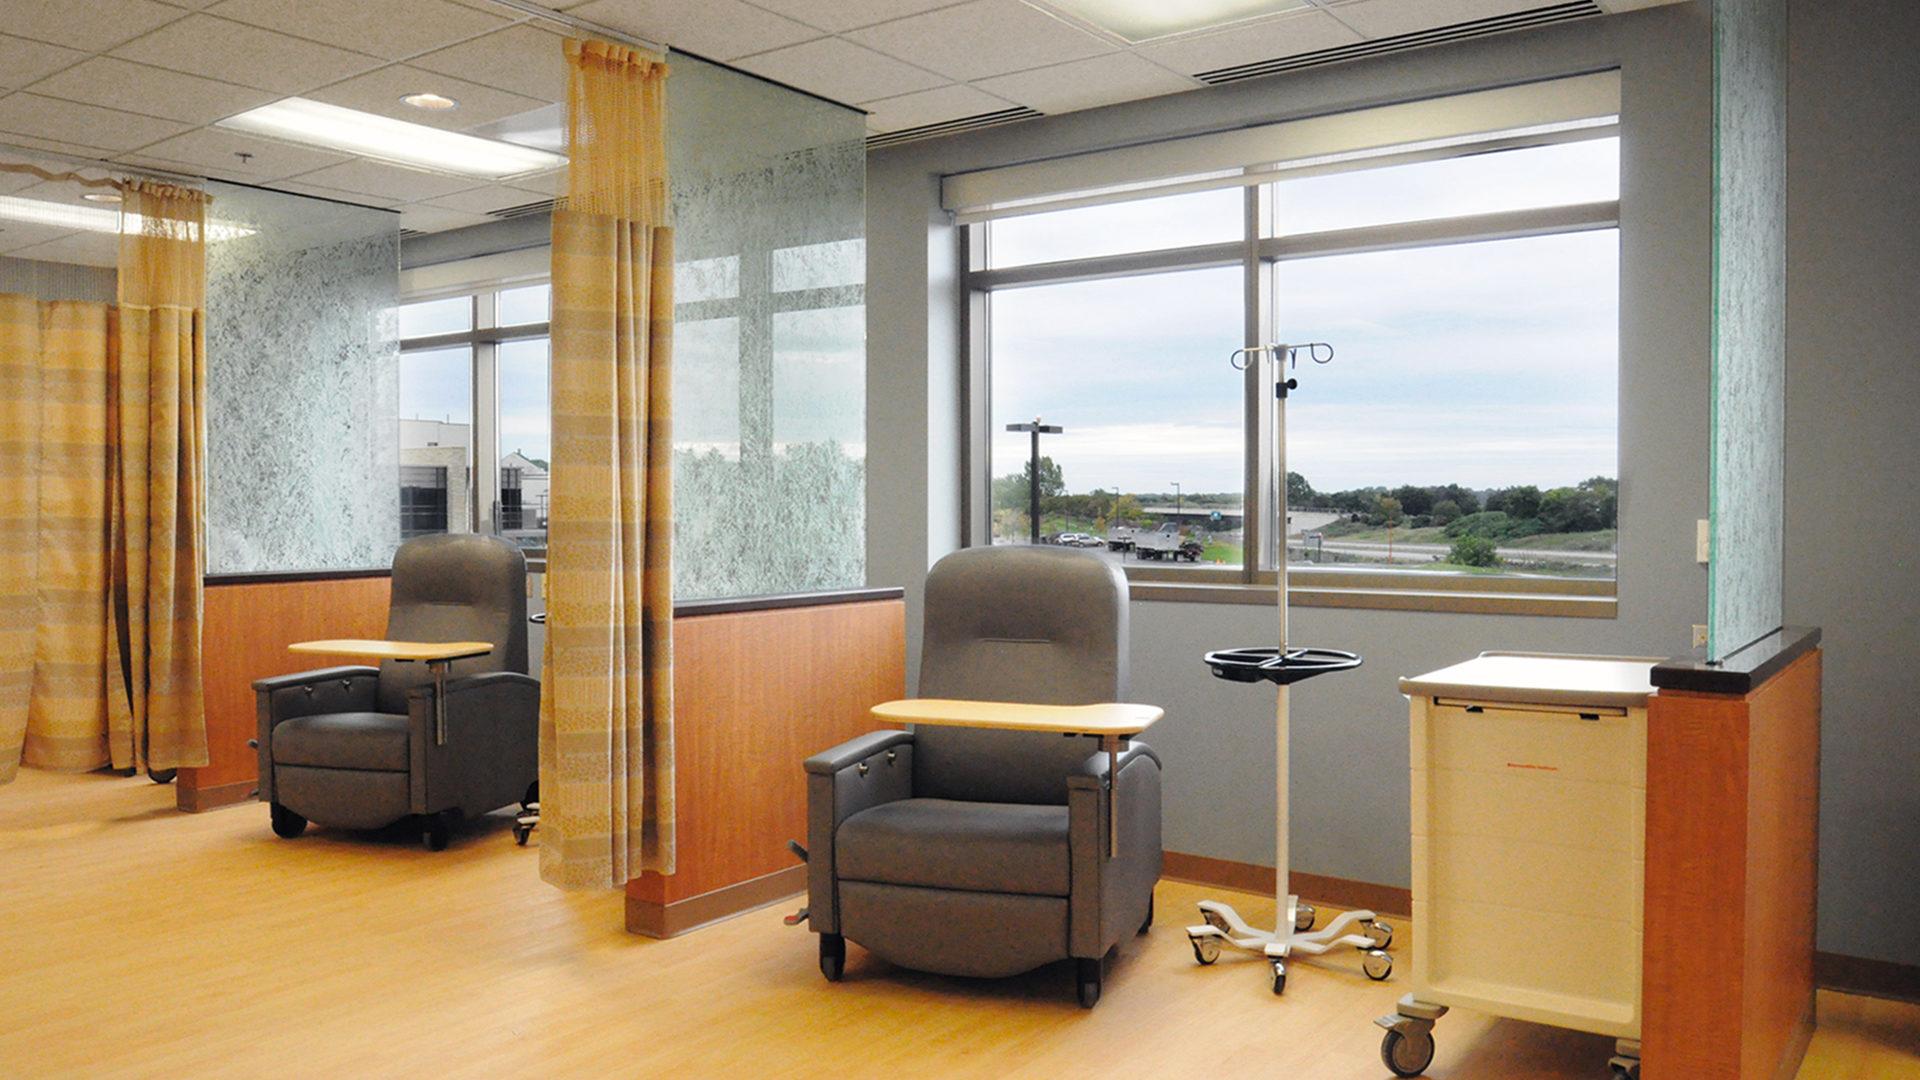 Fairview Ridges Specialty Care Center Burnsville Interior Cancer Treatment Suite